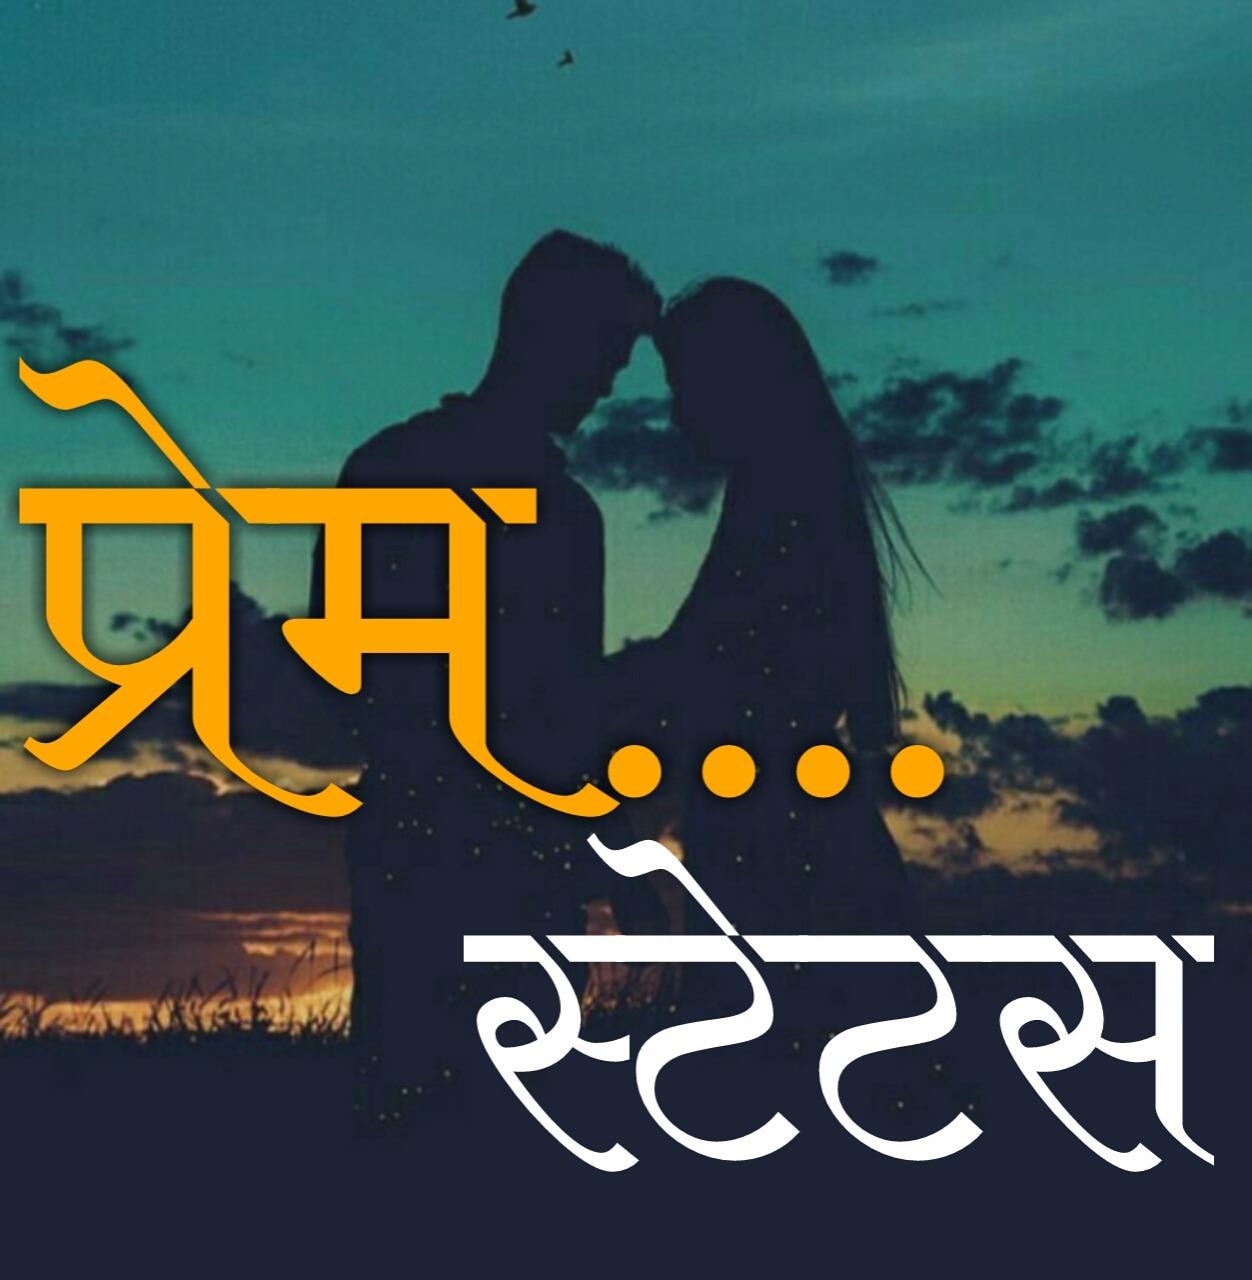 Prem Status In Marathi: Best status for couples in marathi